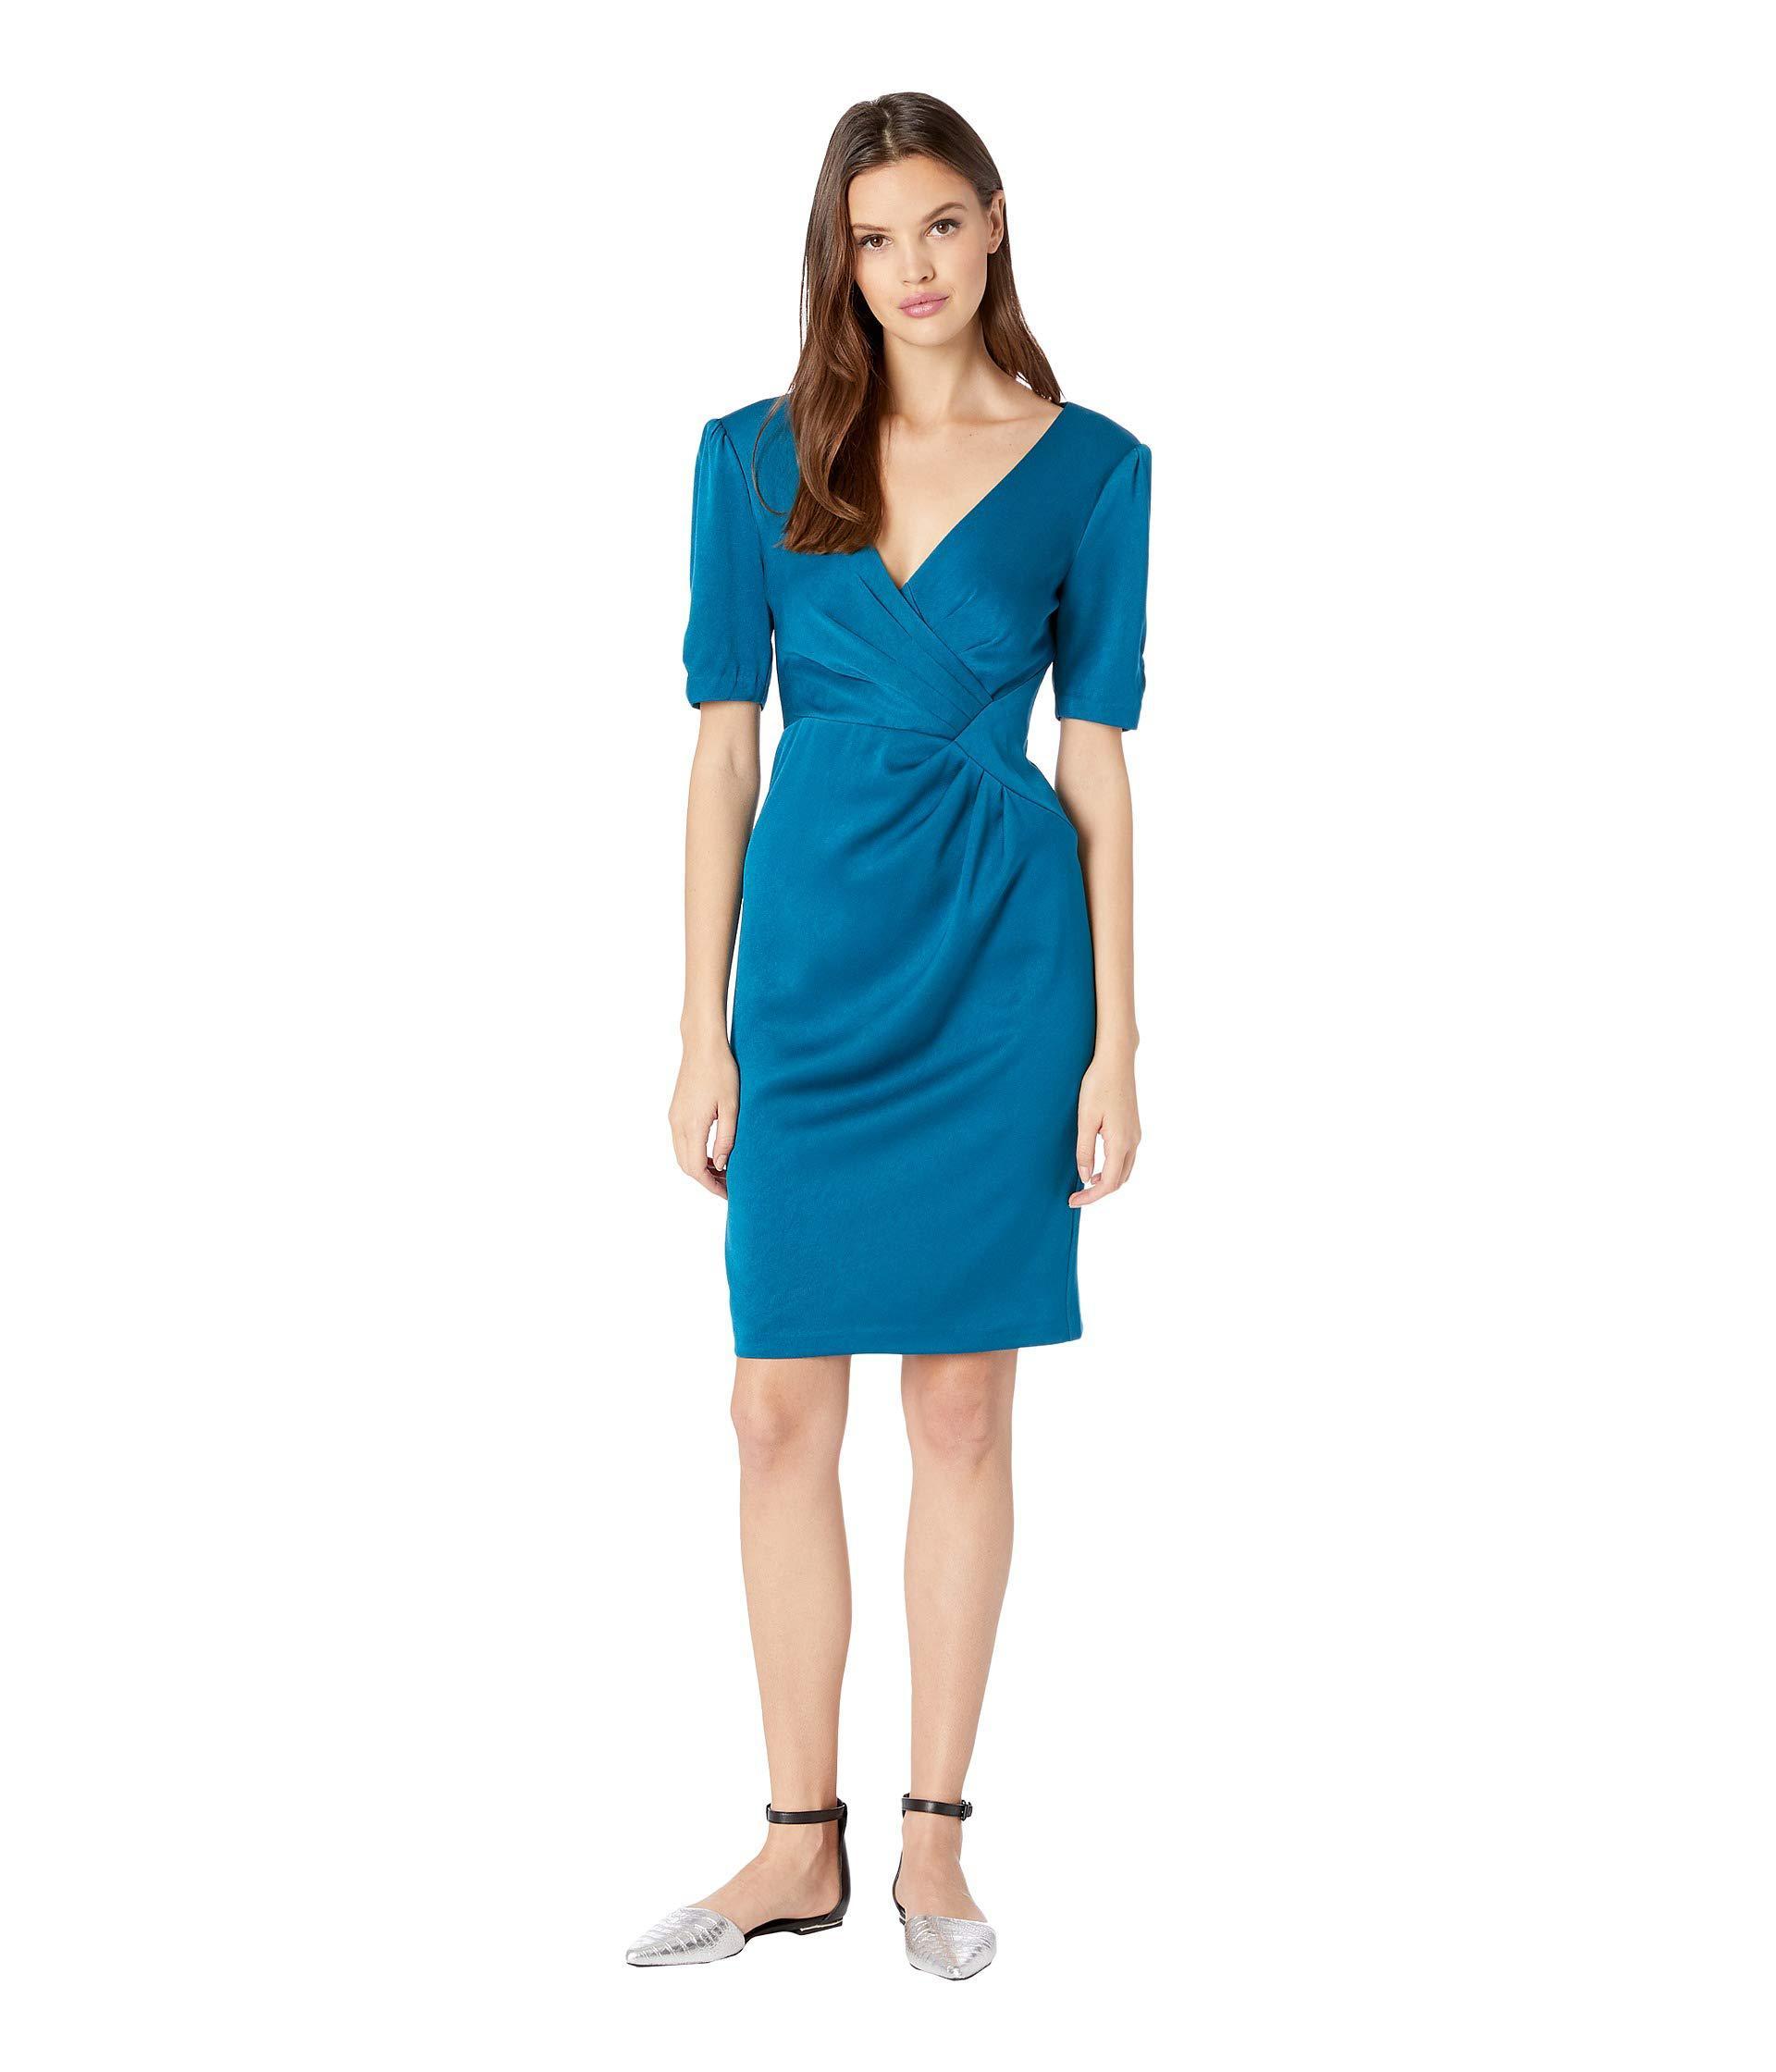 d3d62fafc3 Nanette Lepore Carnival Dress (peacock) Women s Dress in Blue - Lyst